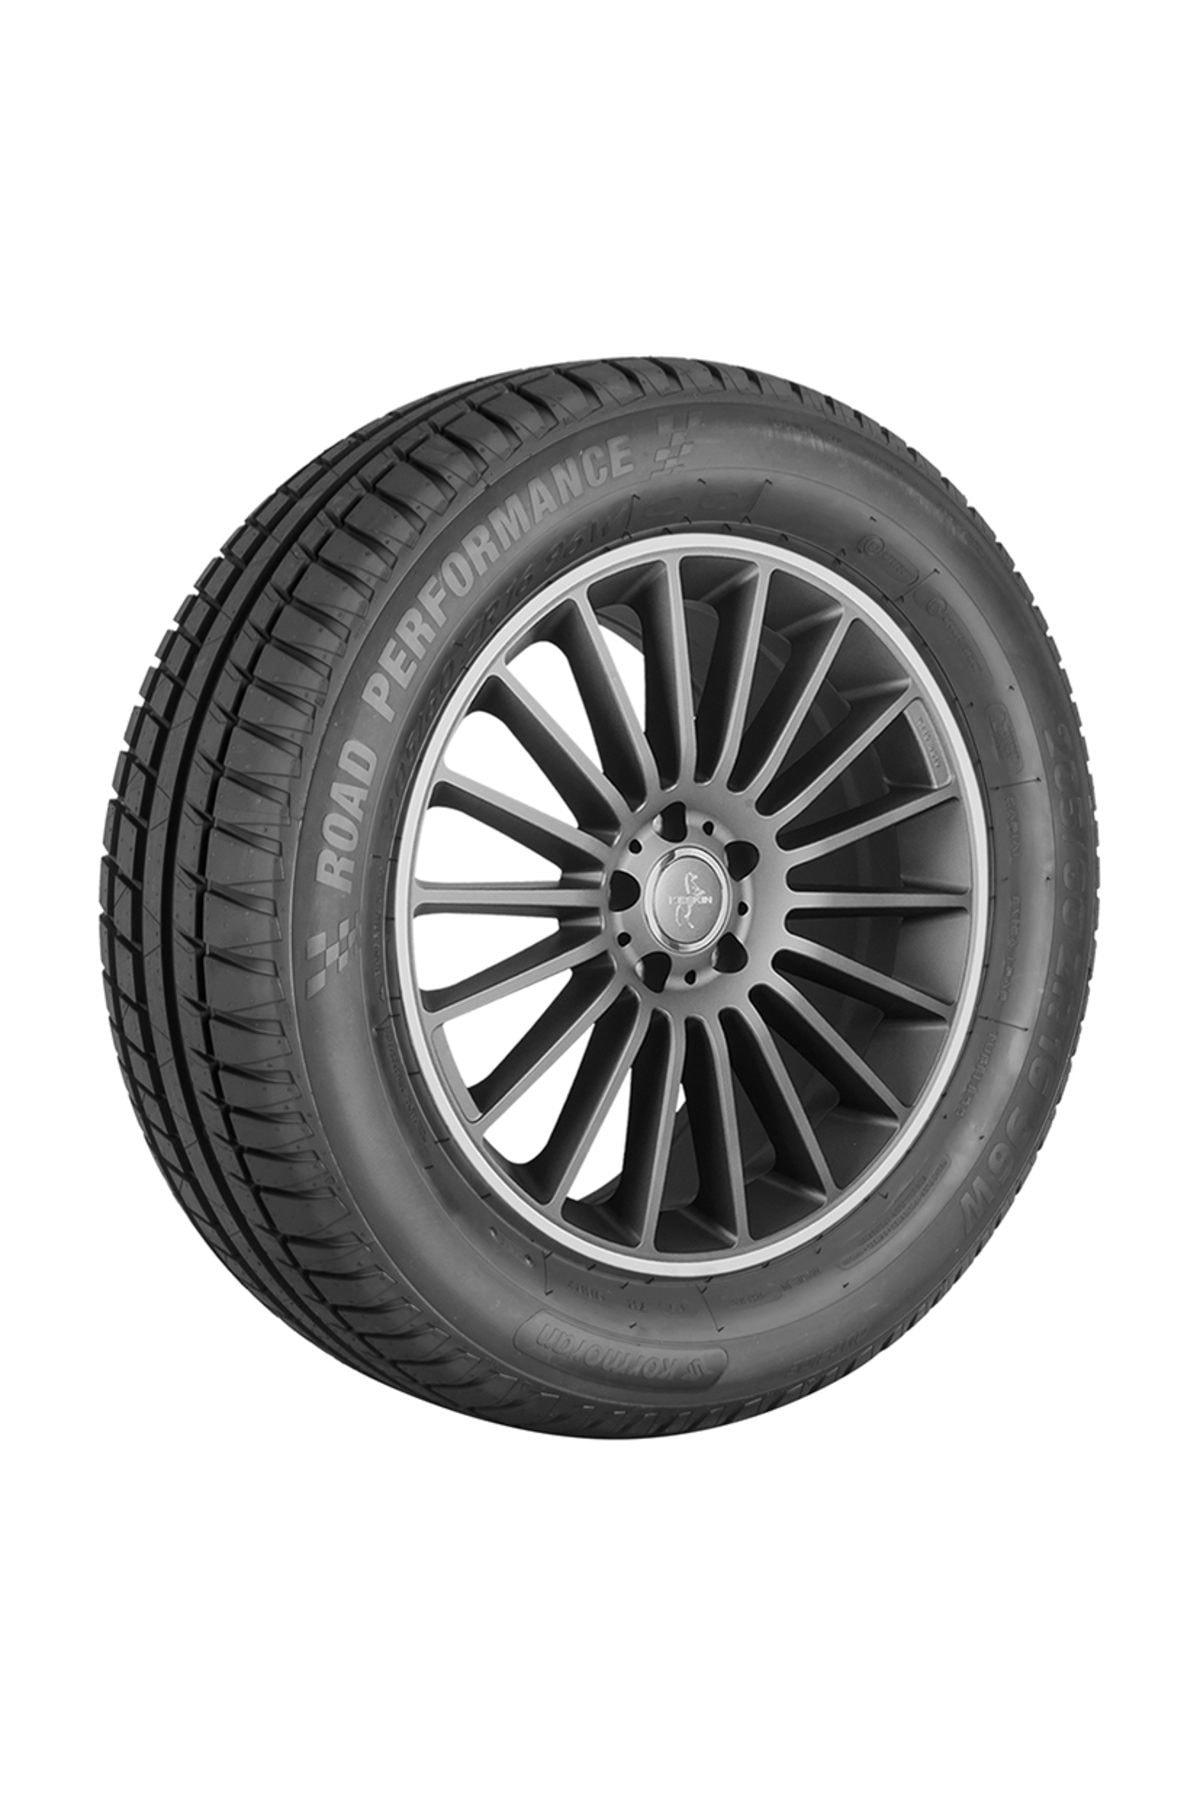 Kormoran 195/50R16 88V Xl Road Performance Yaz Lastik 2021 1